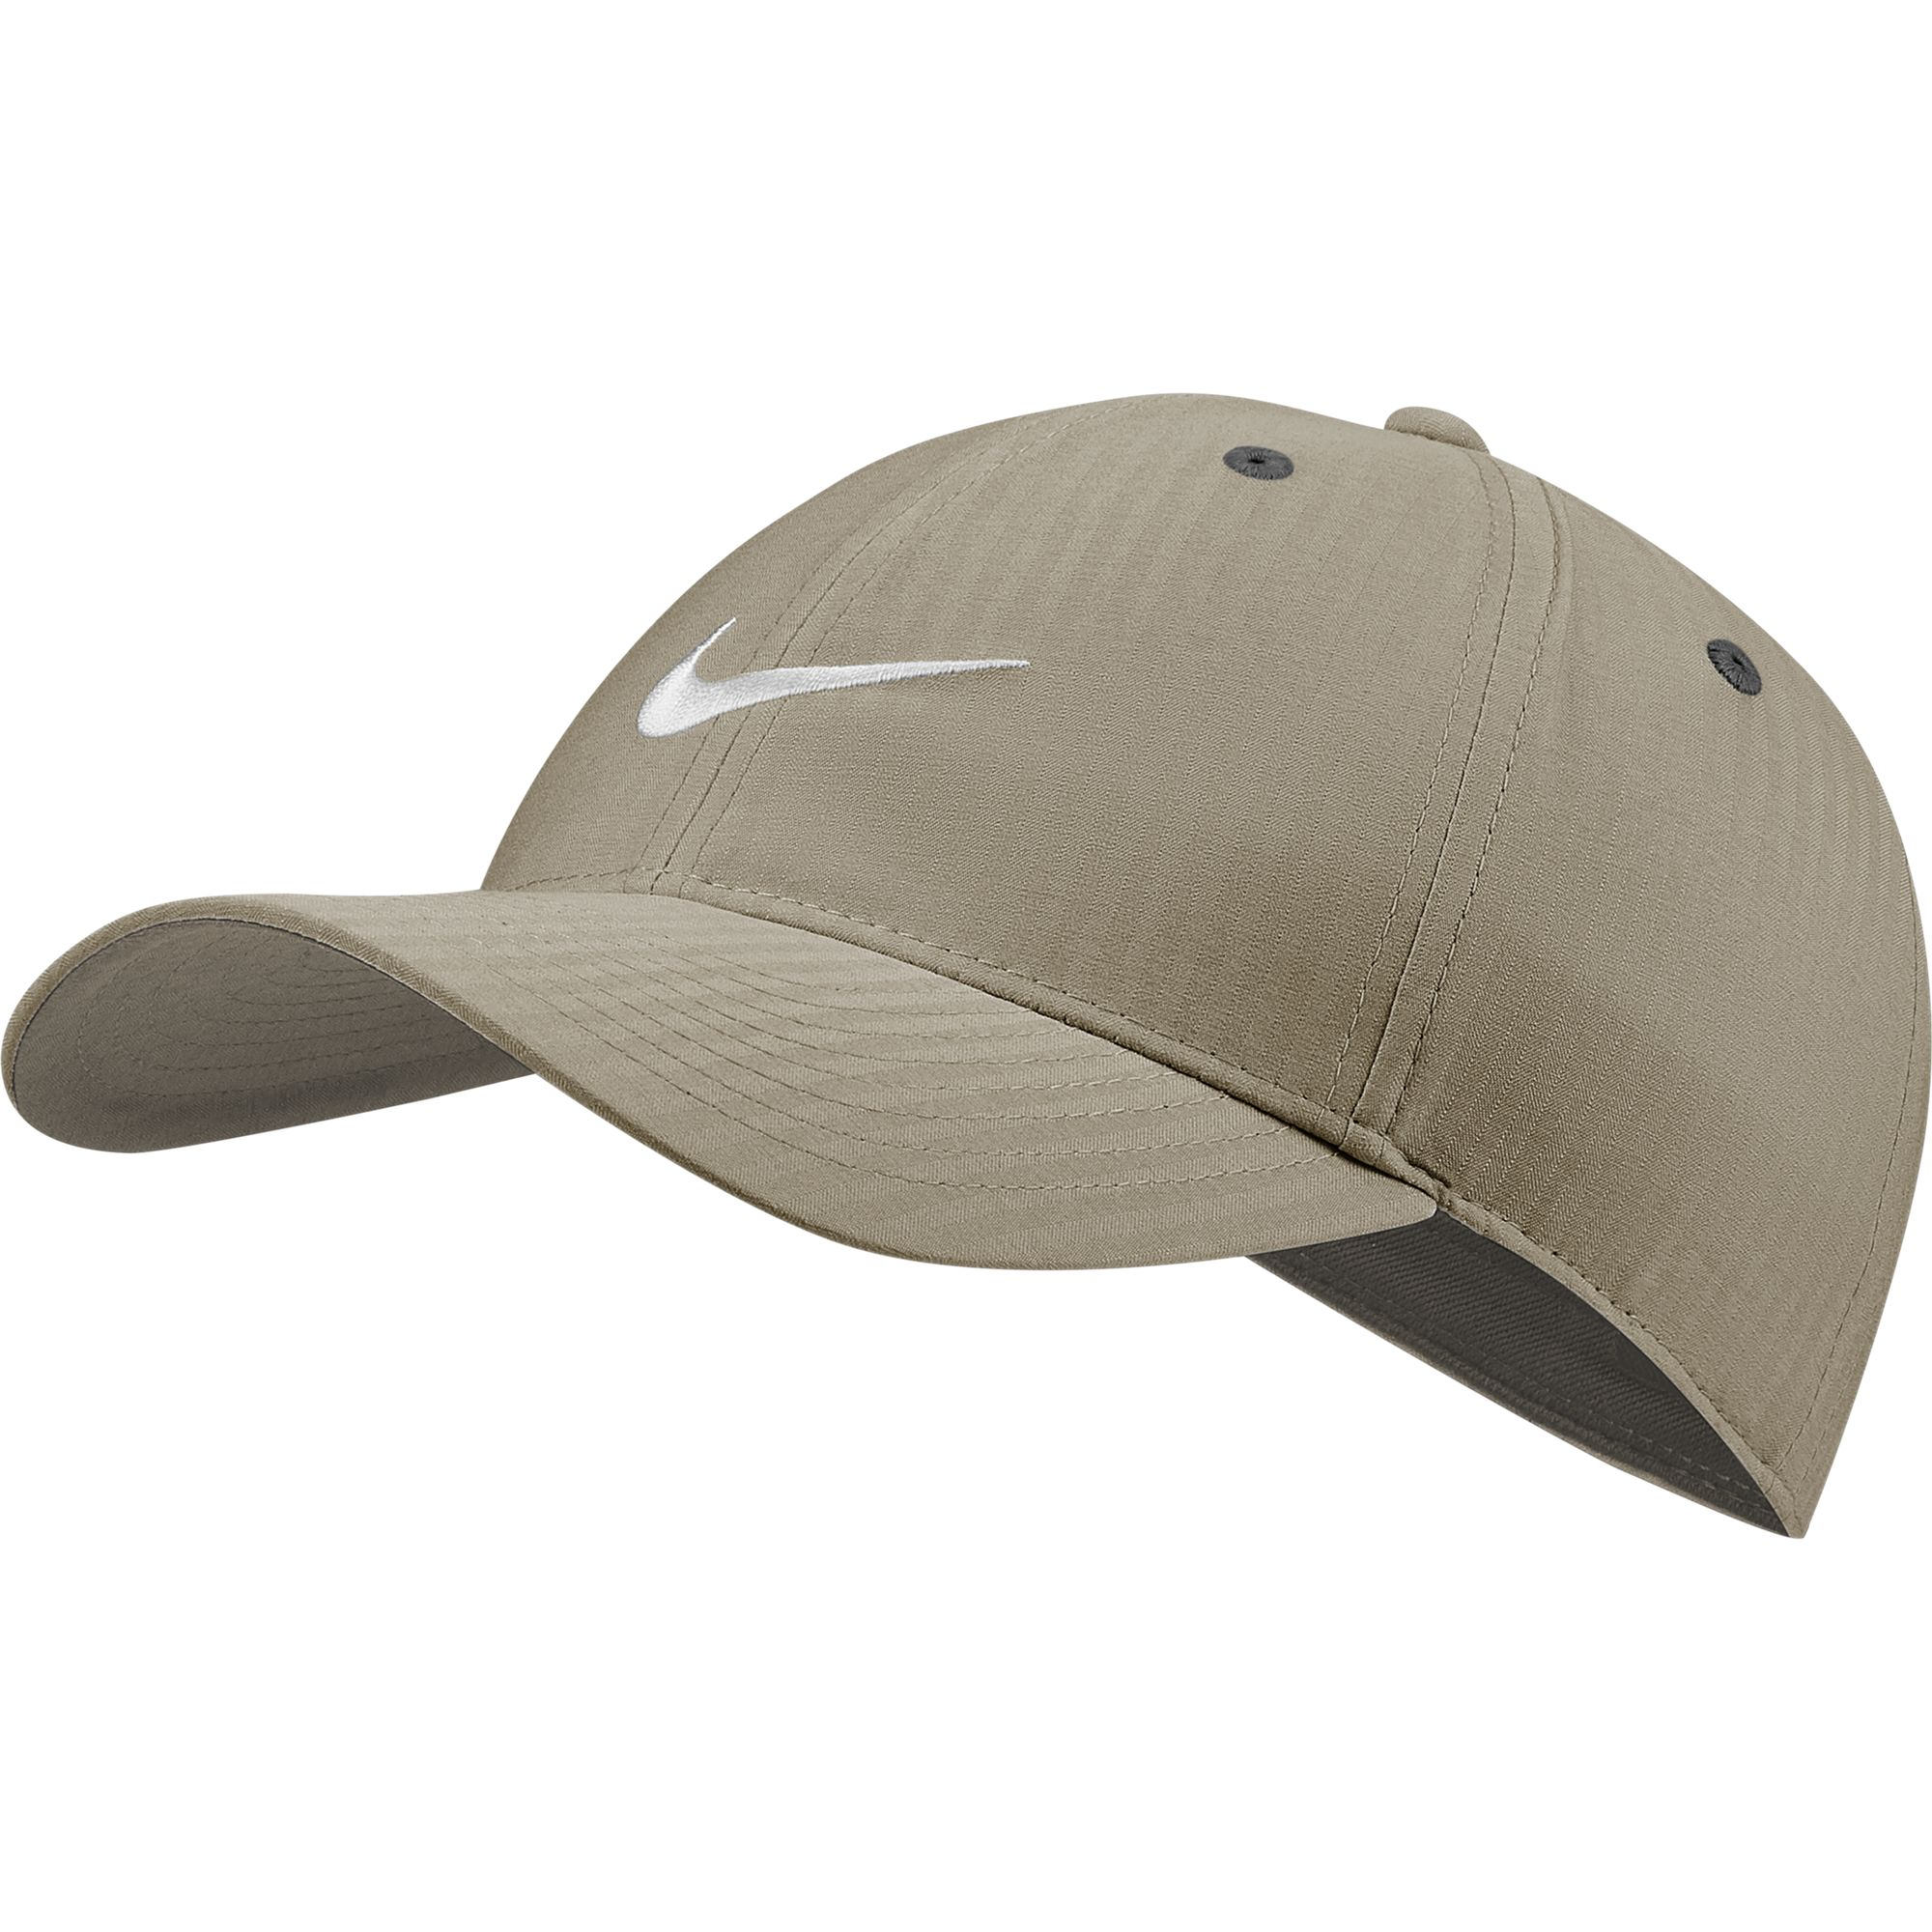 Men's Legacy91 Golf Hat, Tan,Beige,Fawn,Khaki, swatch